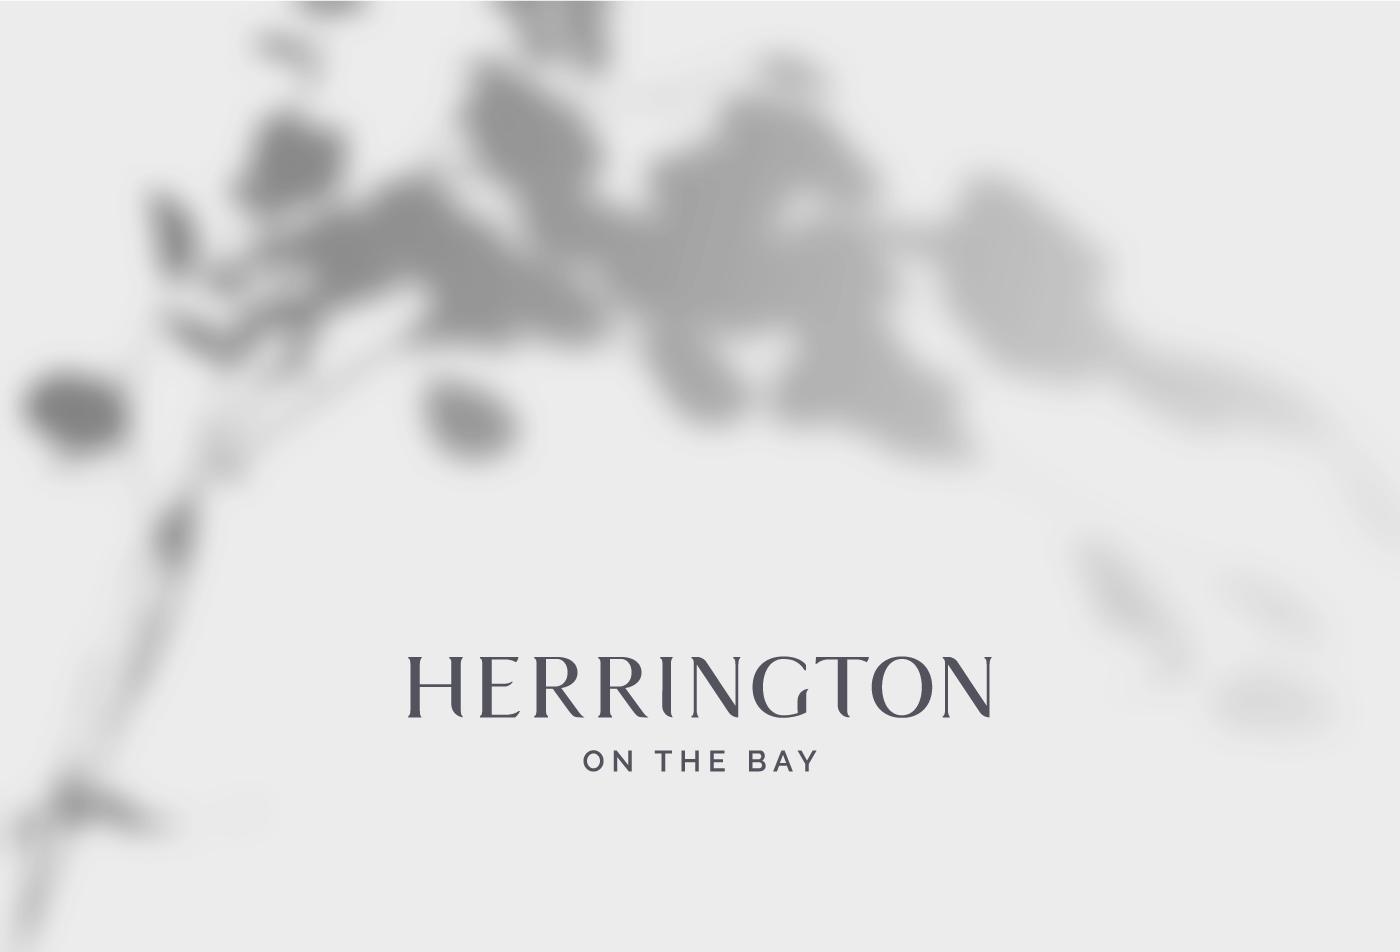 Herrington on the Bay